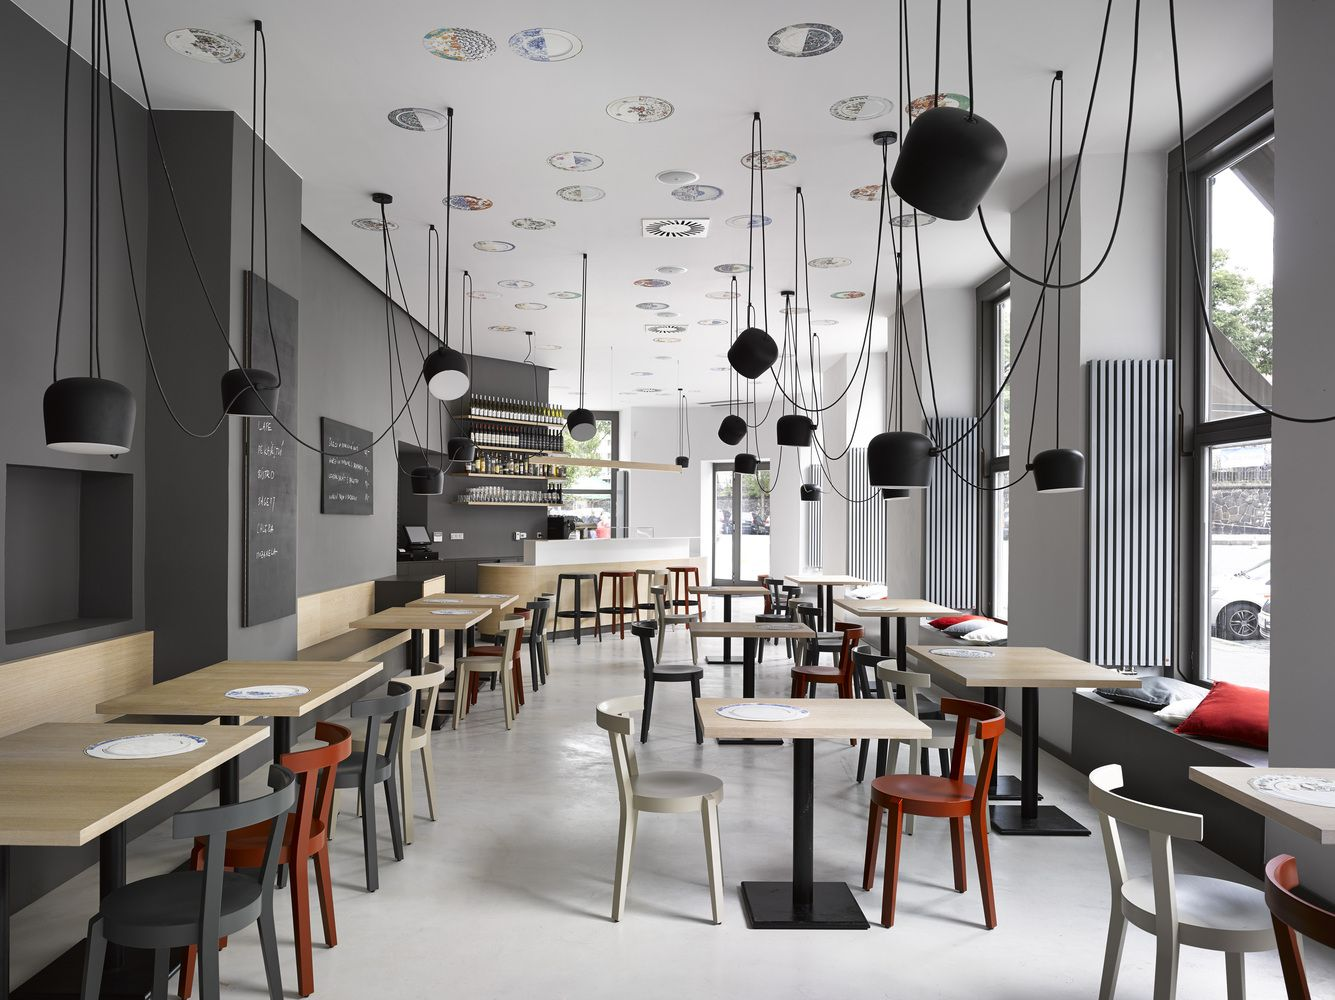 Gallery of cafe bistro bakery zahorsky jra jarousek rochova architekti